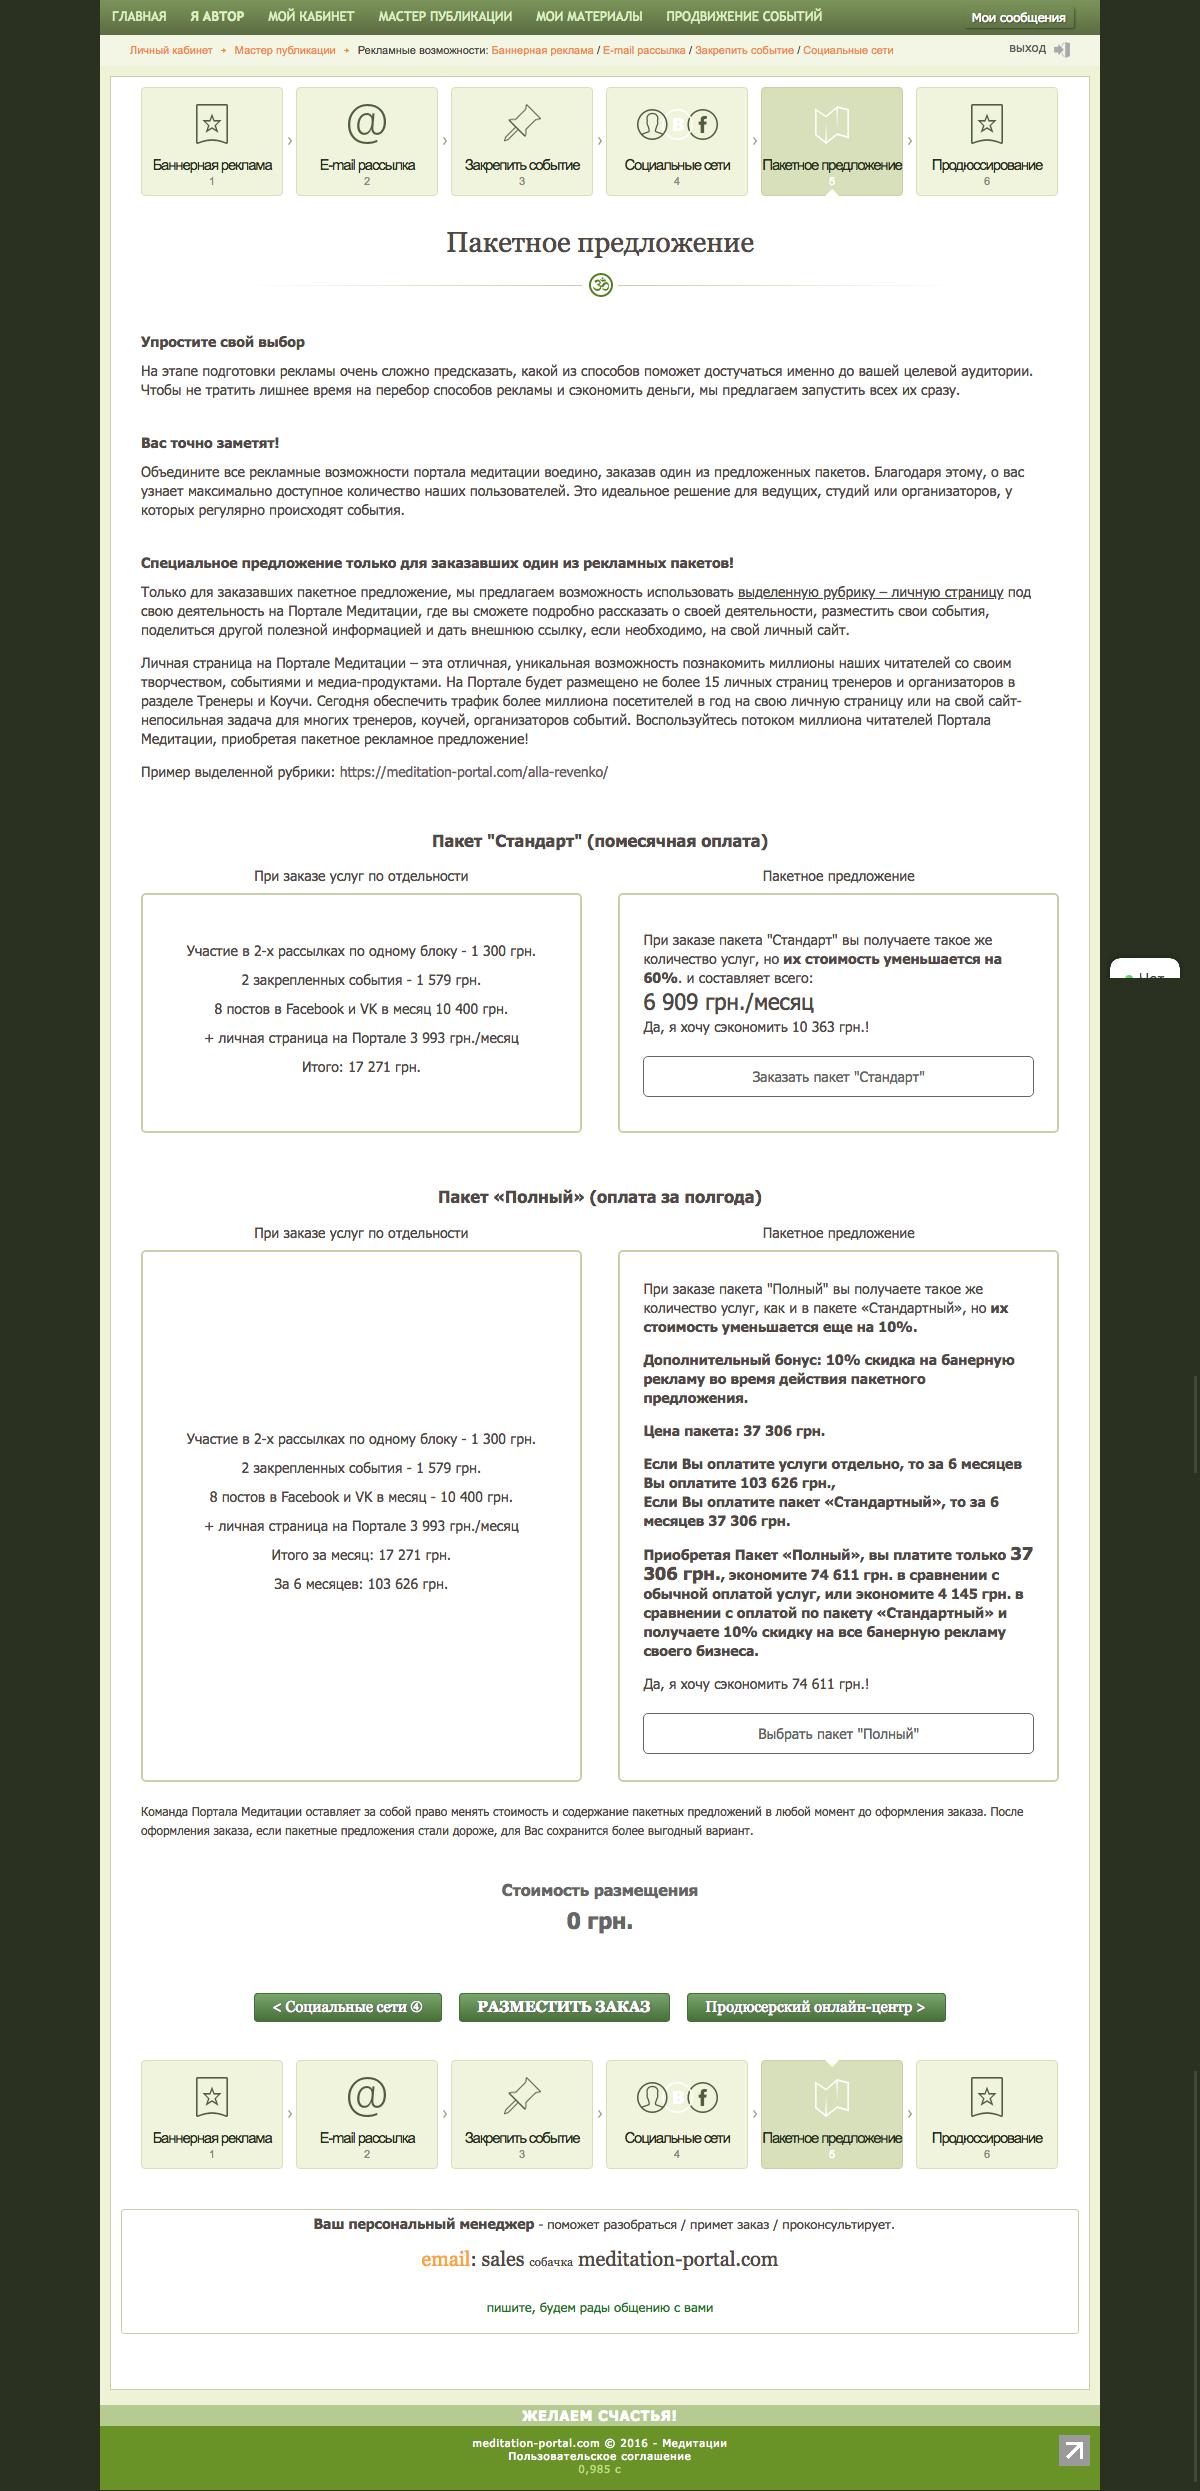 Master_publikatsii_commertial